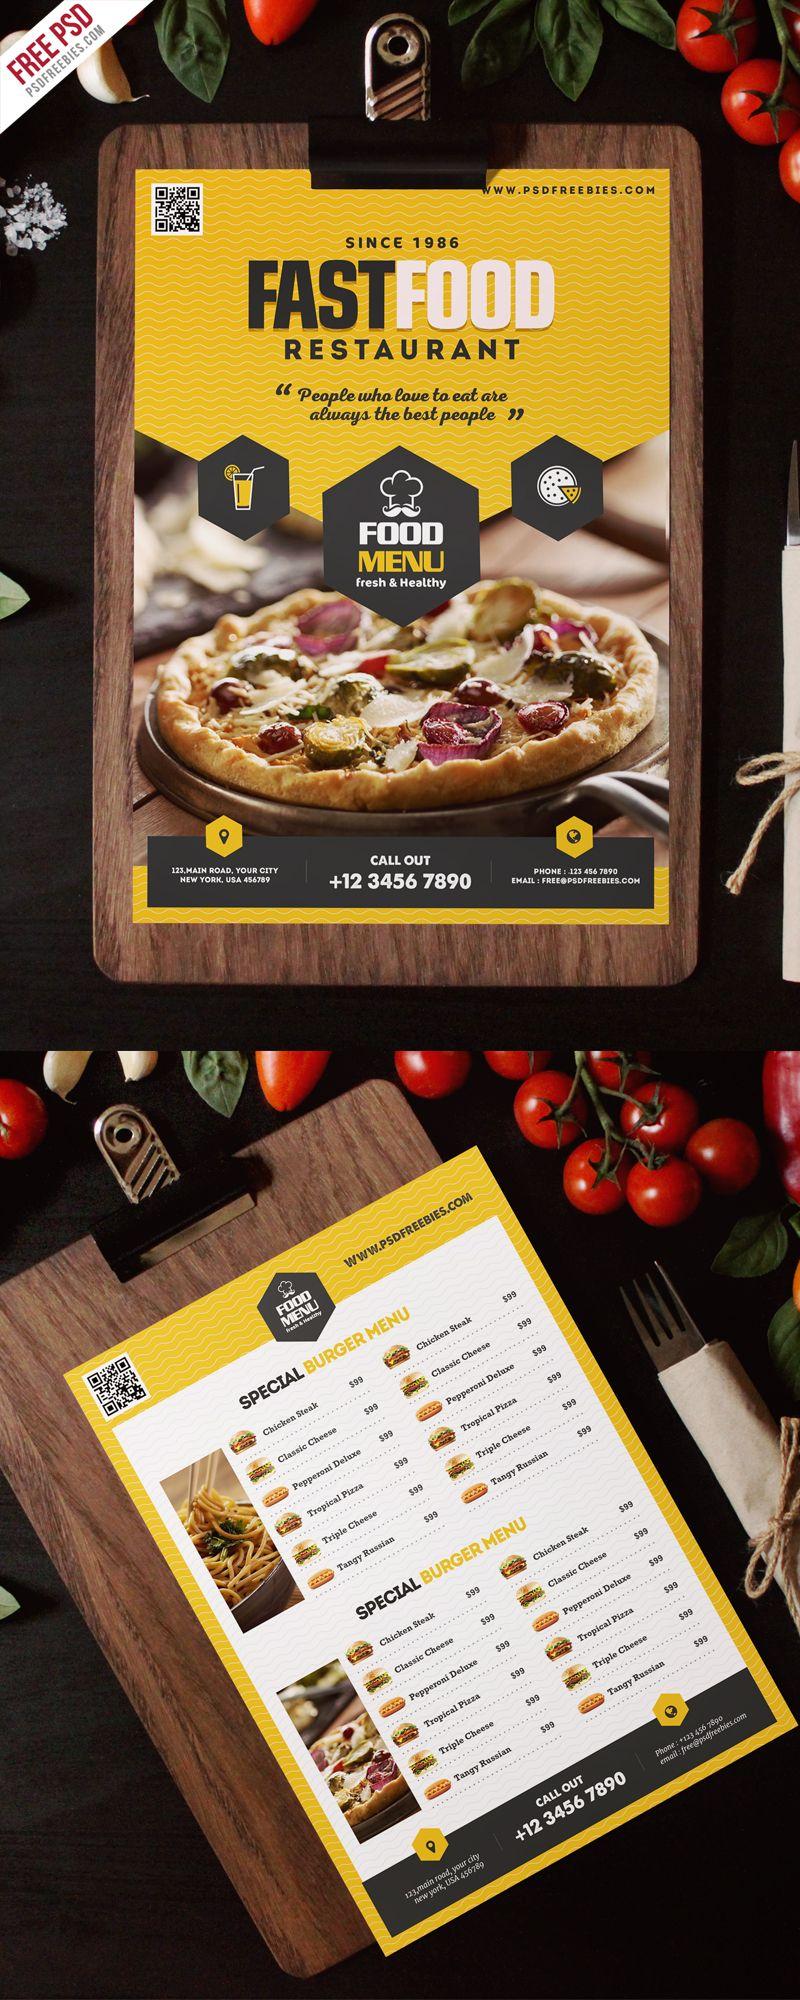 Fast Food Restaurant Menu Flyer Template Psd Menu Flyer Fast